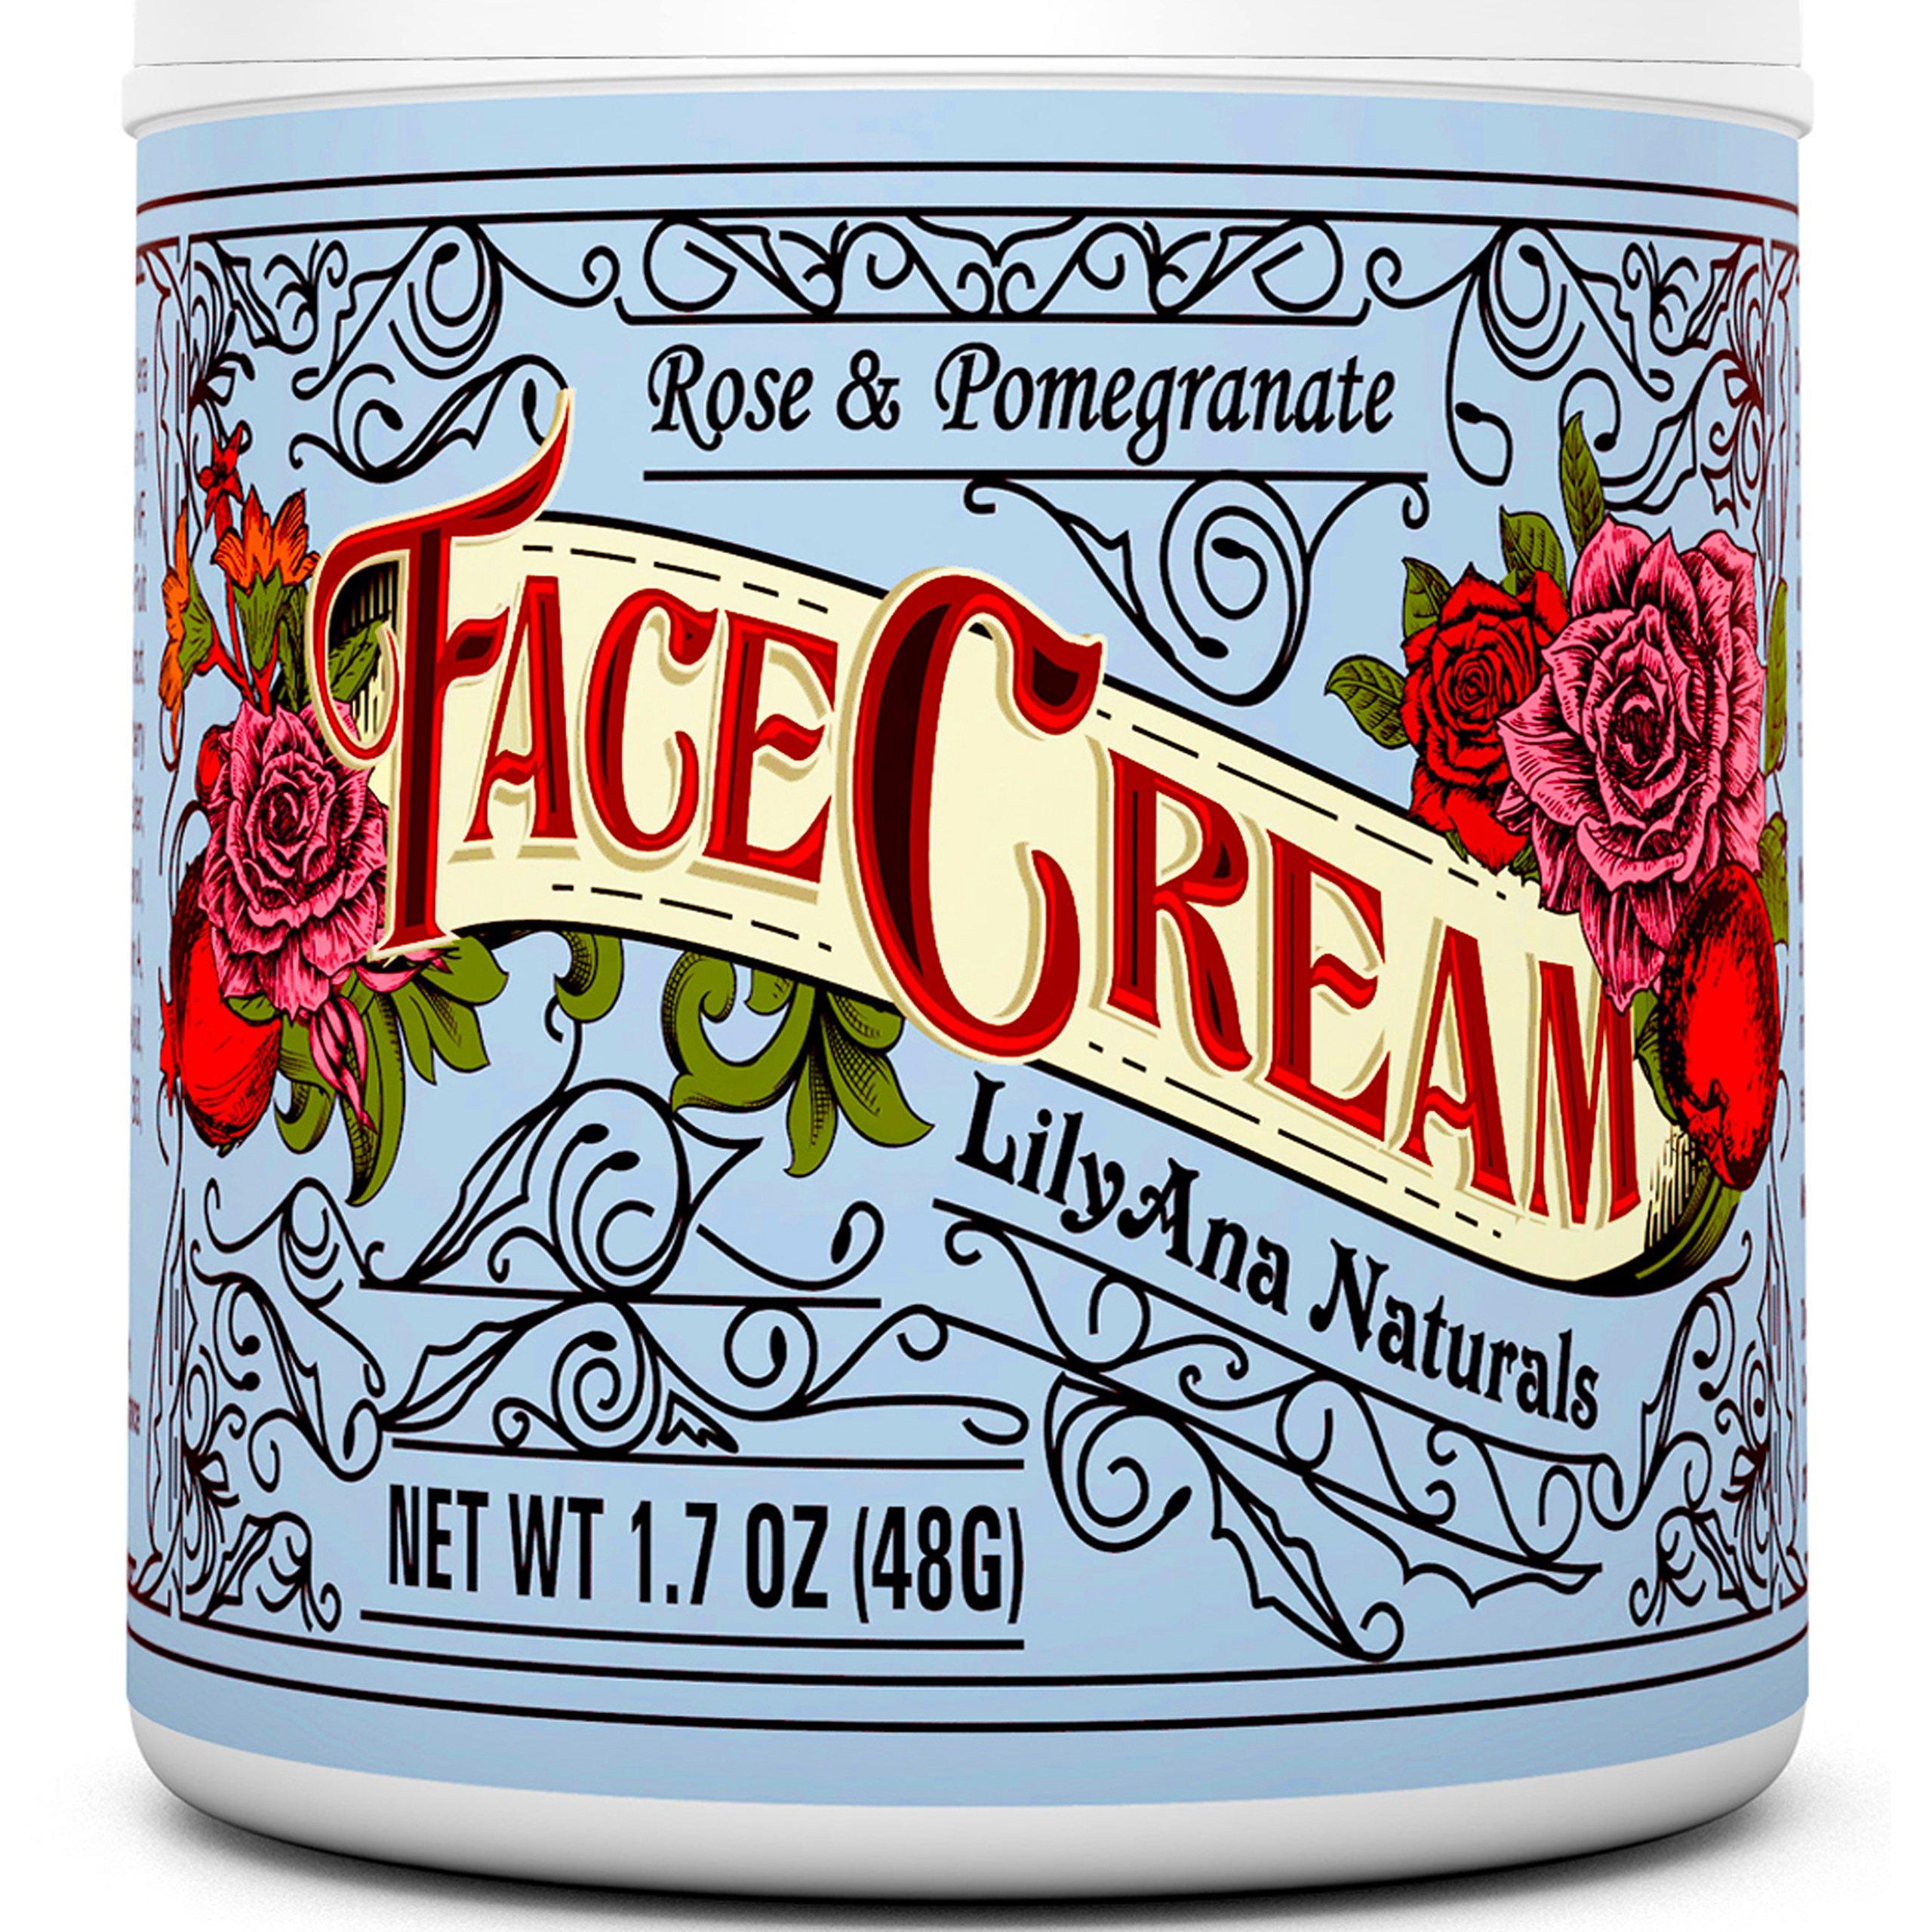 Face Cream Moisturizer (1.7 OZ) Natural Anti Aging Skin Care by LilyAna Naturals